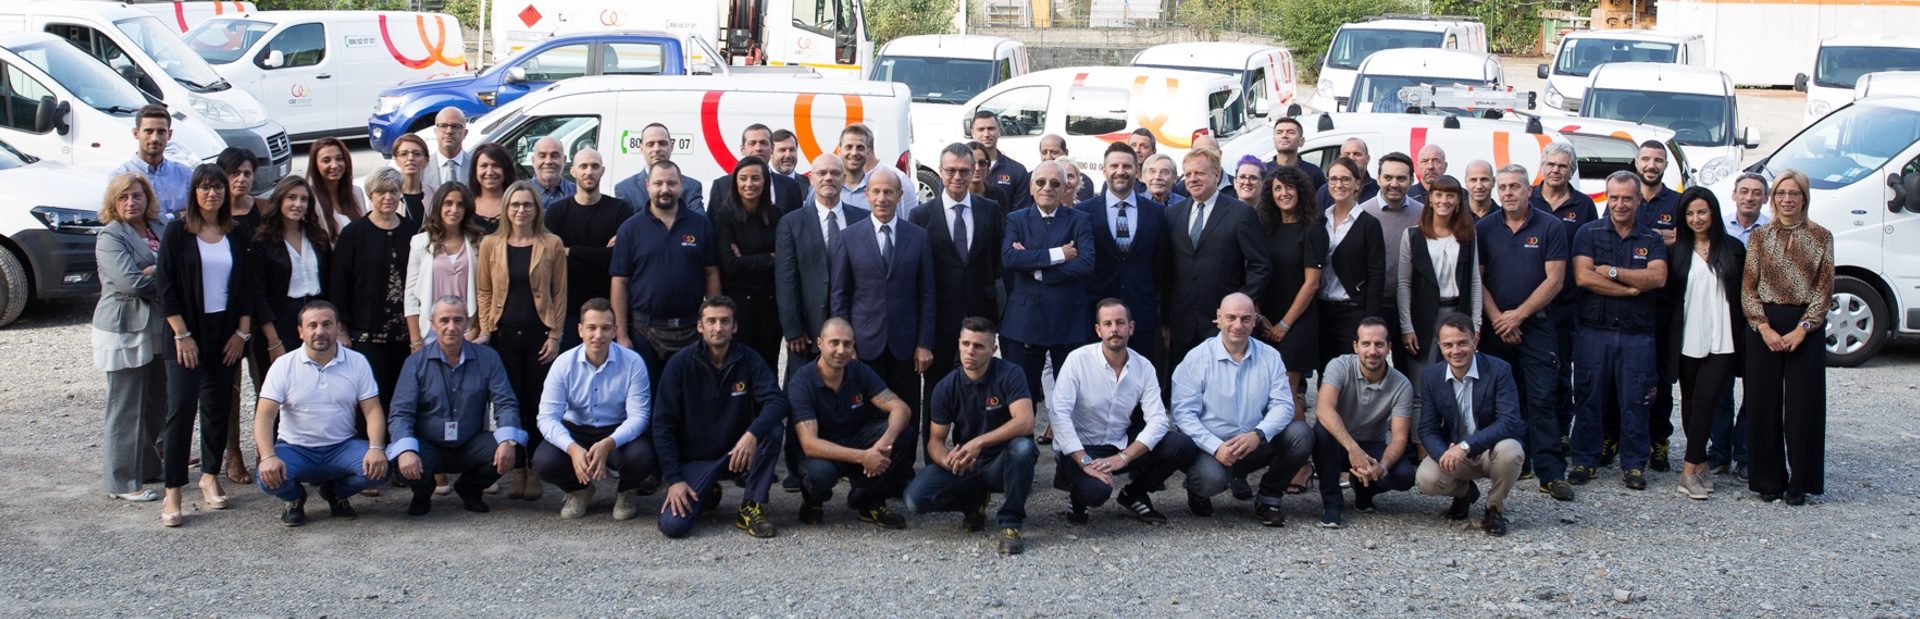 Il team di CEI GROUP: professionalità ed efficienza | CEI GROUP | ceigroup.it